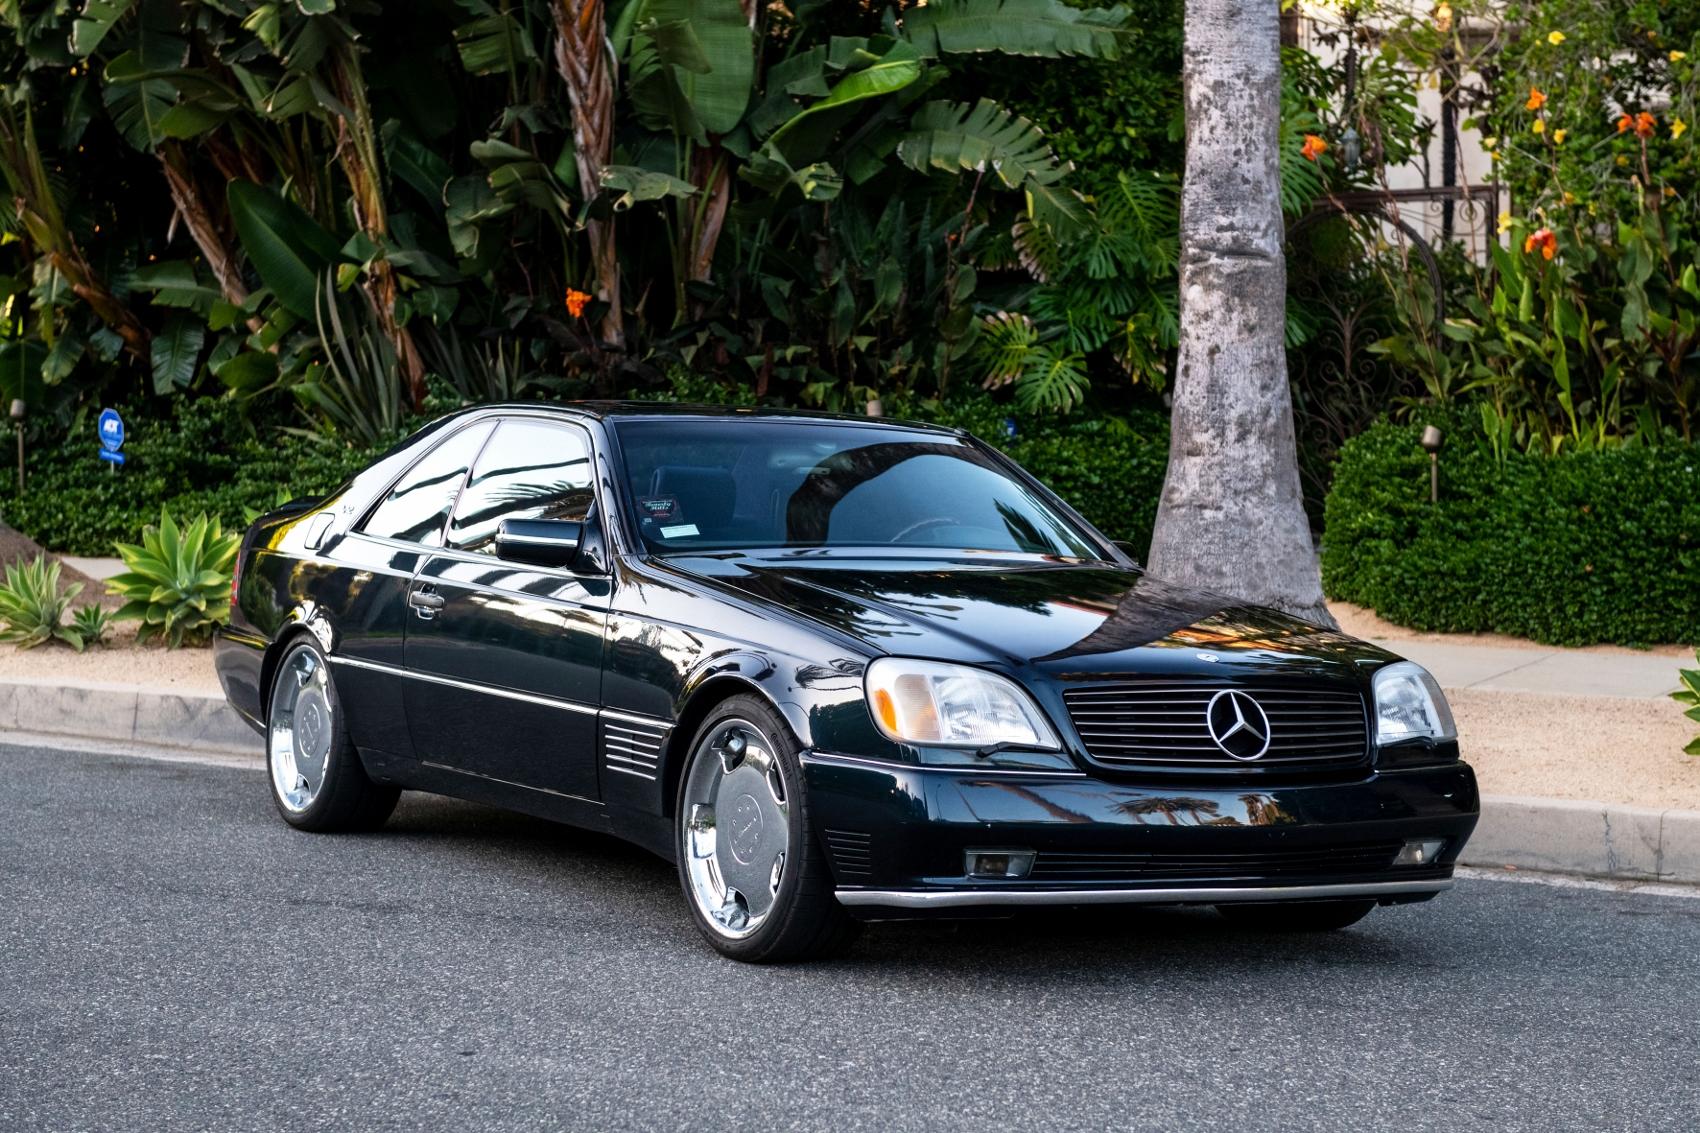 Pozrite si Mercedes S600 Michaela Jordana z roku 1996 QKaKLxZQek lorinsercl600ex-jordanfrontdiagonal